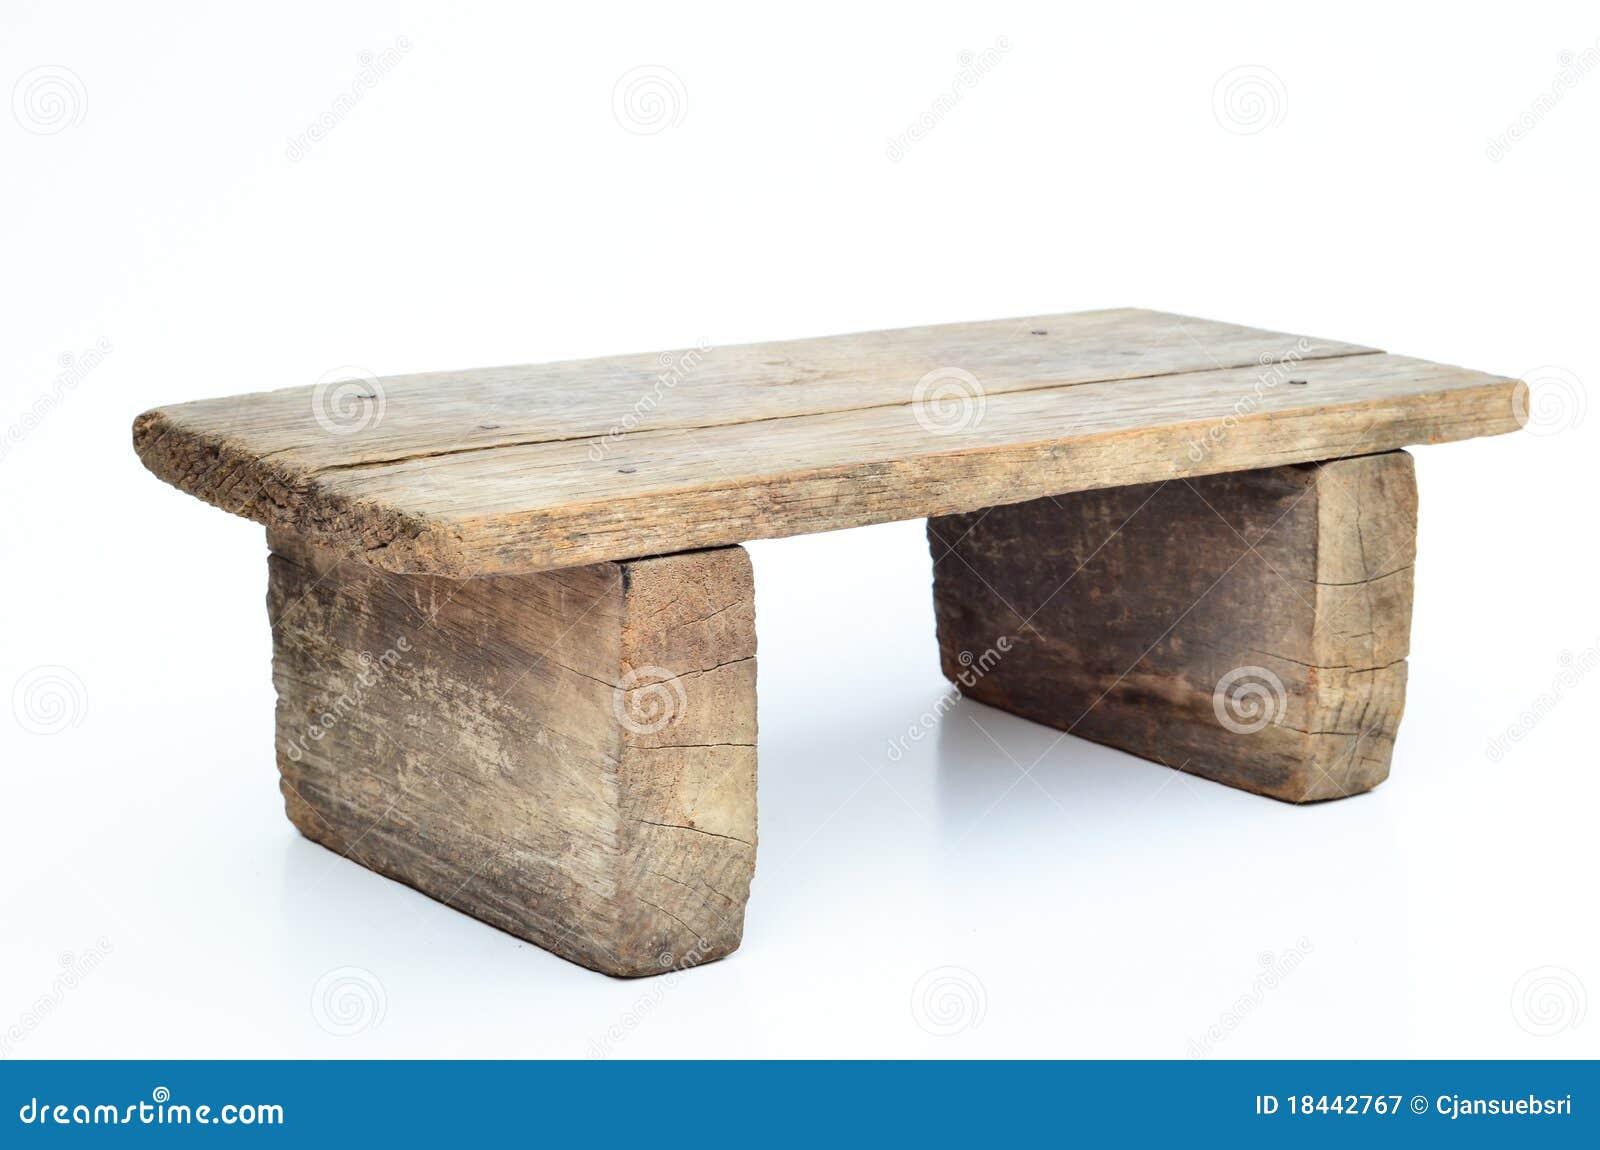 Mini Wood Stool Stock Image Image Of Object Home